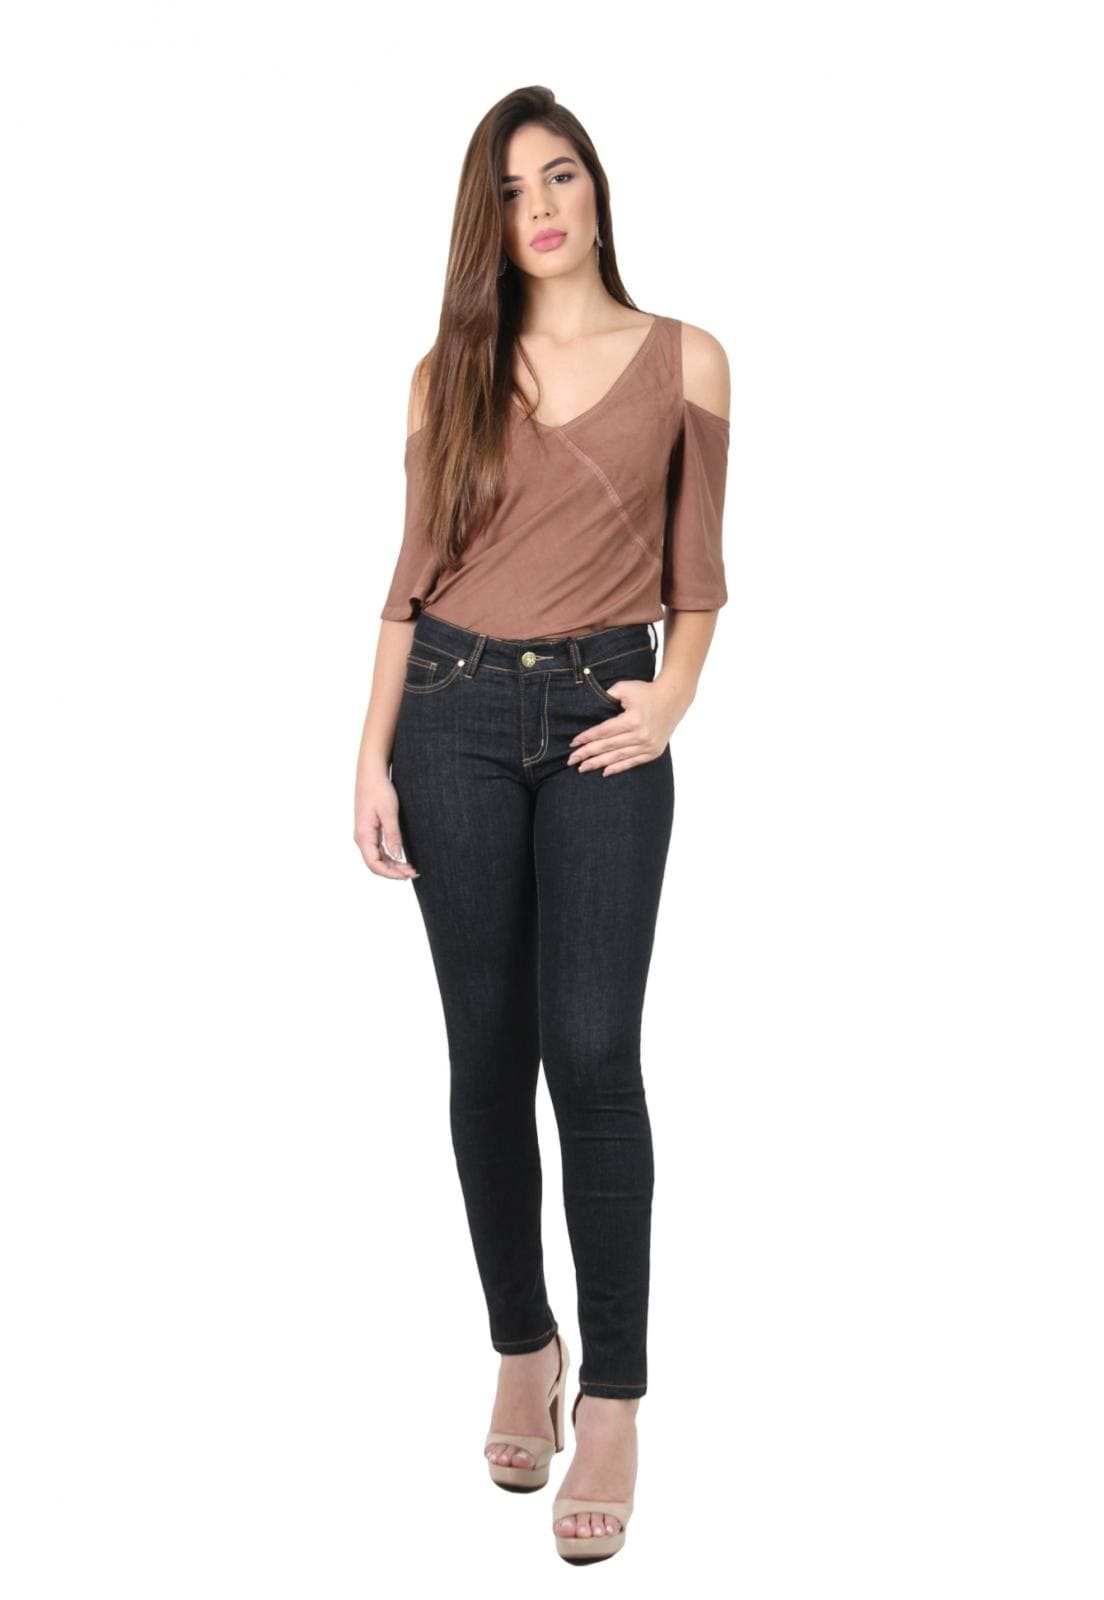 Calça Jeans Feminina Tradicional Skinny Preta